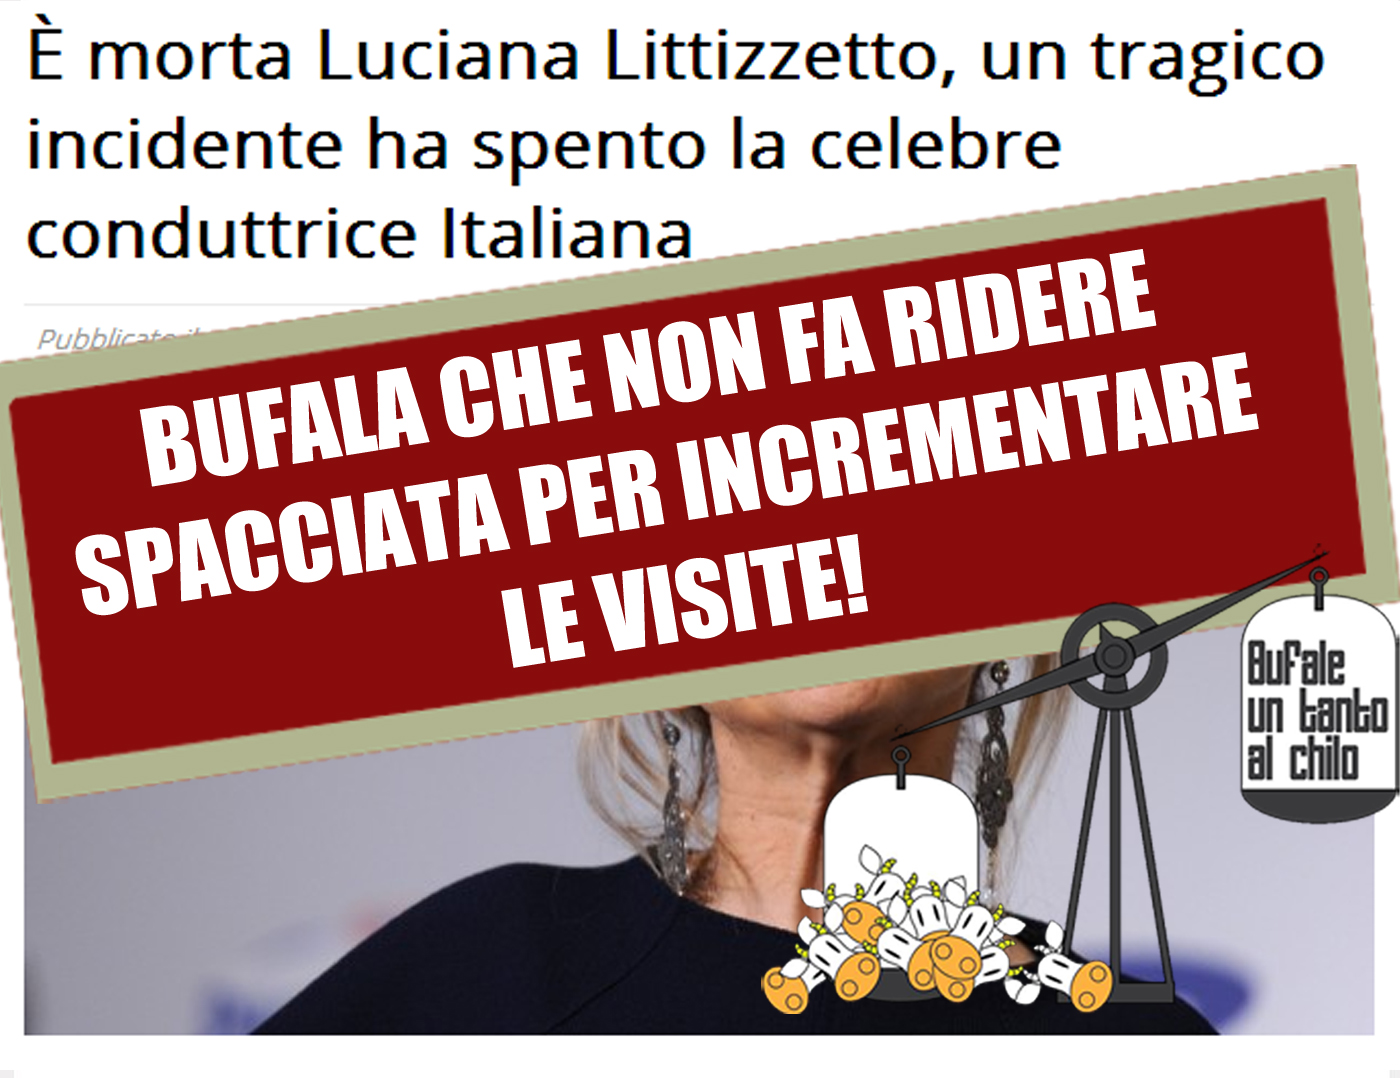 littizzetto2